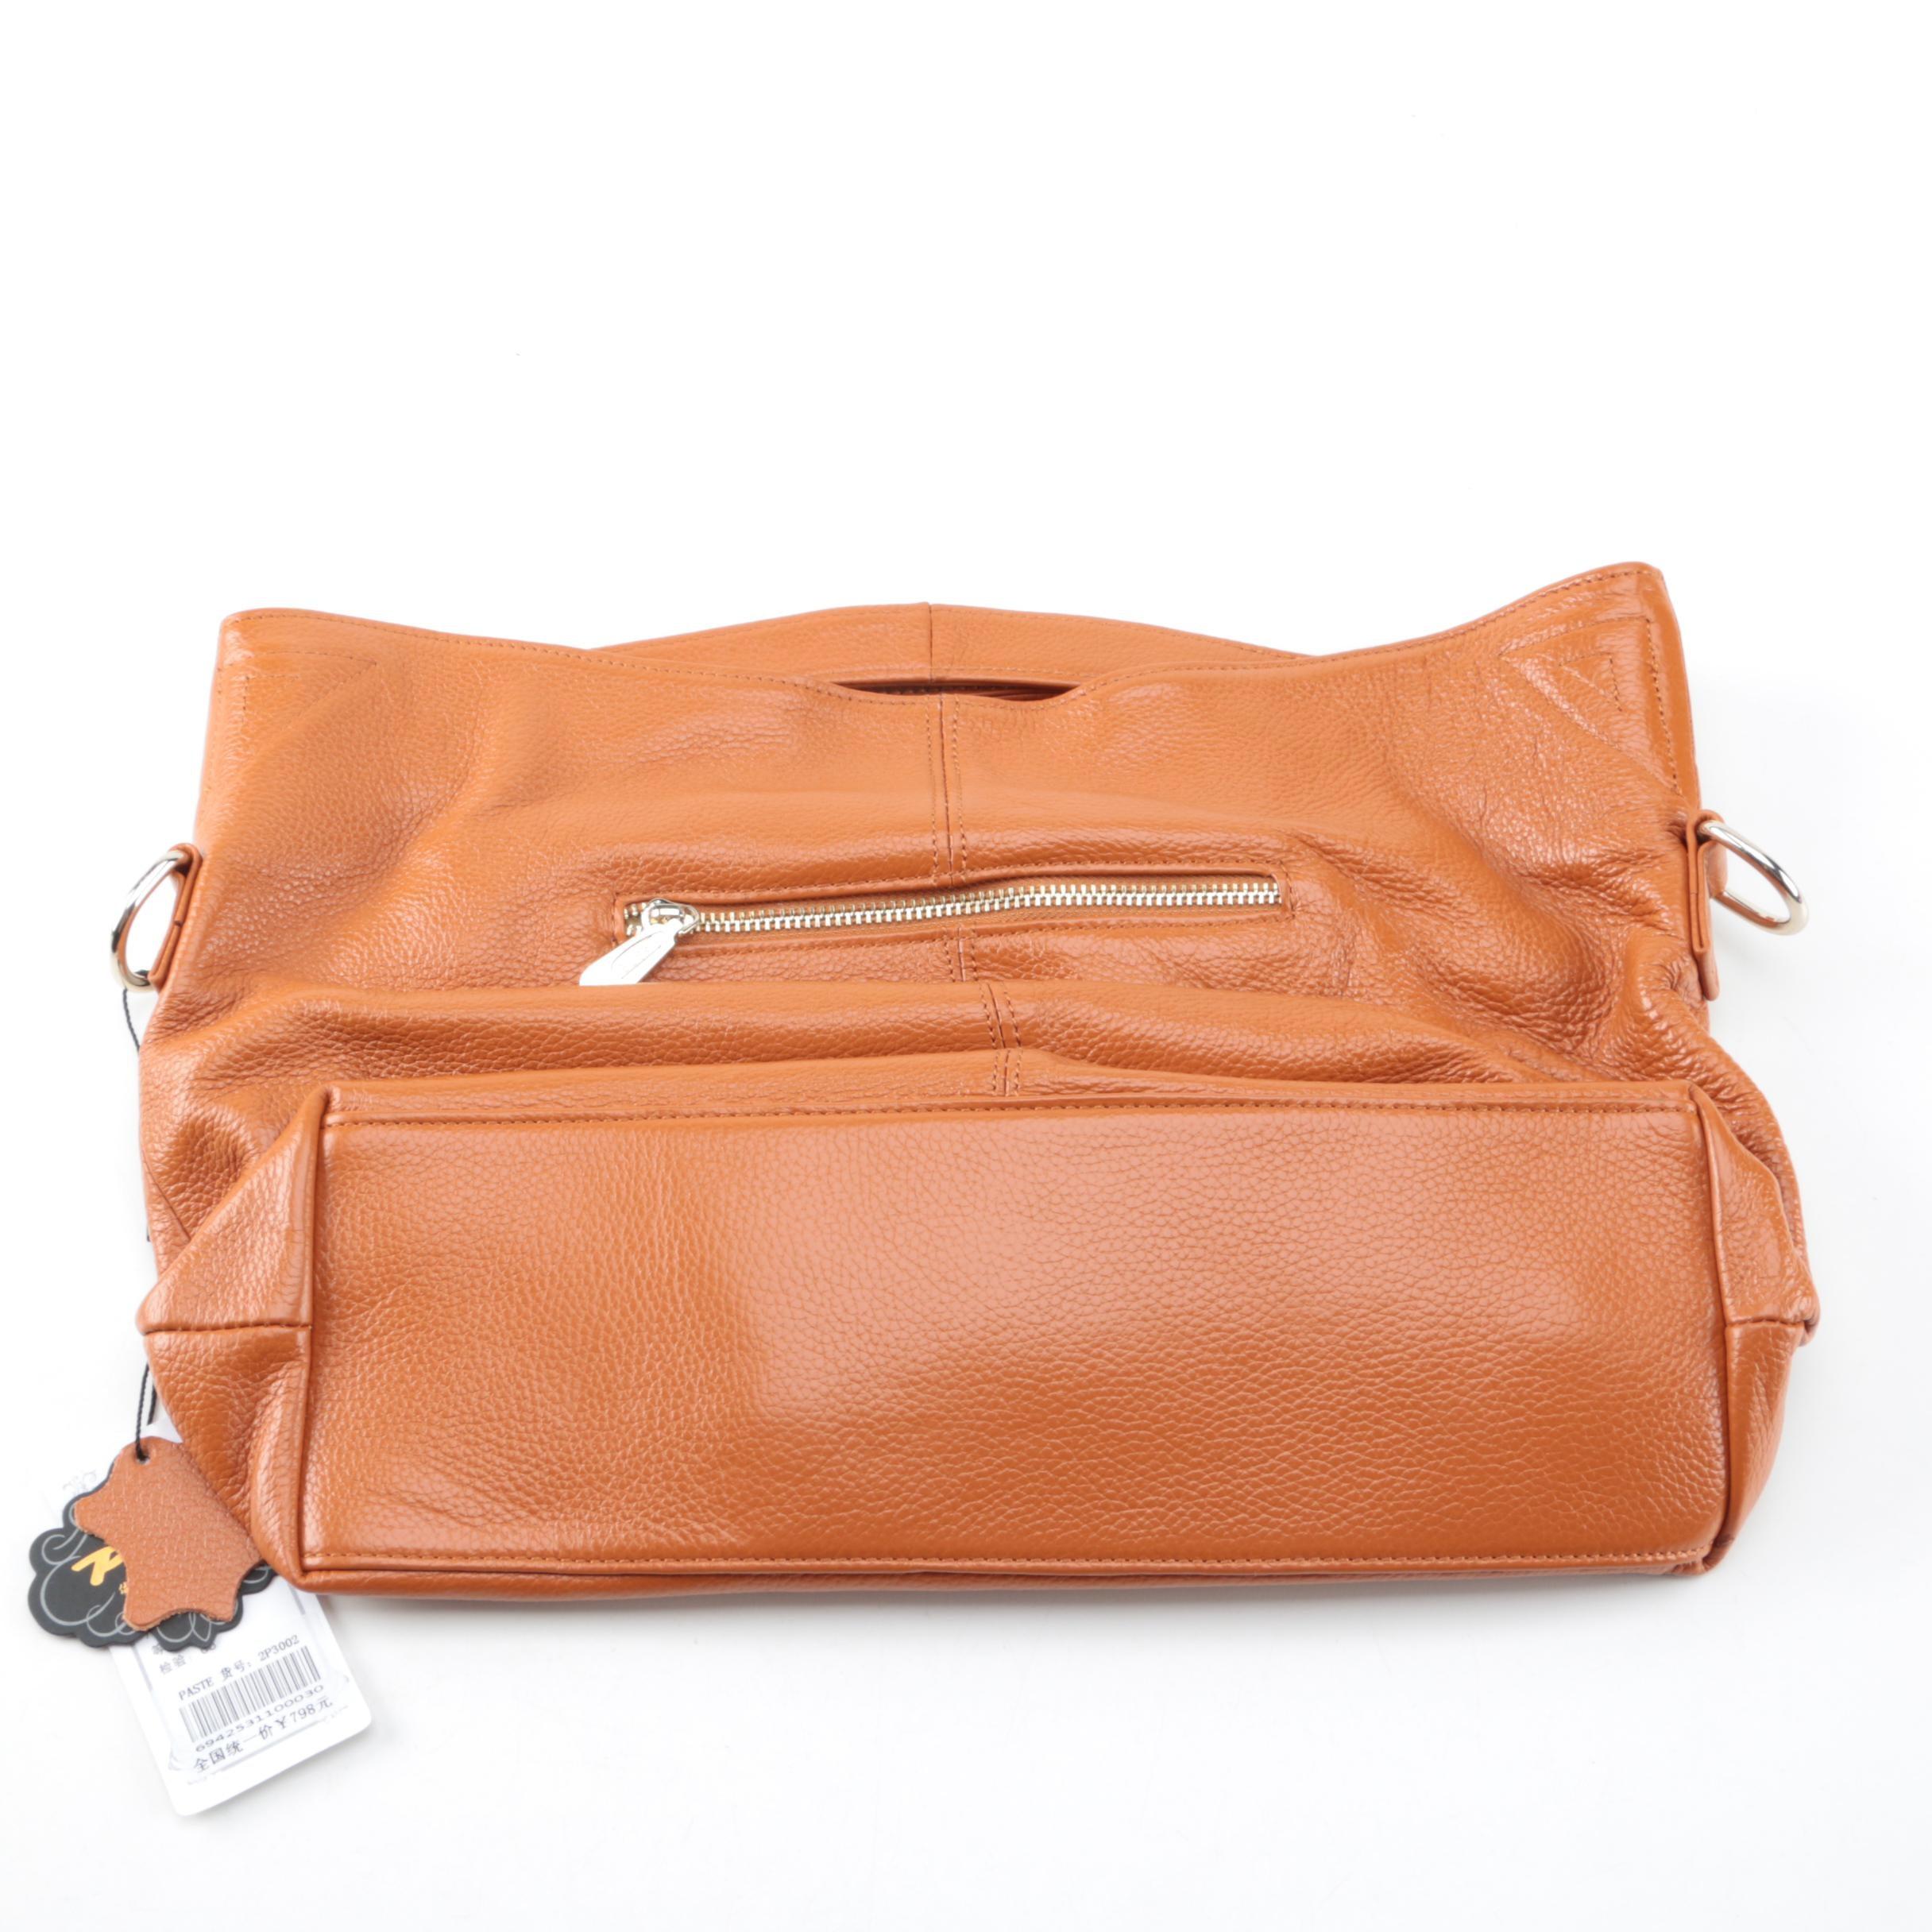 Paste Brown Leather Handbag